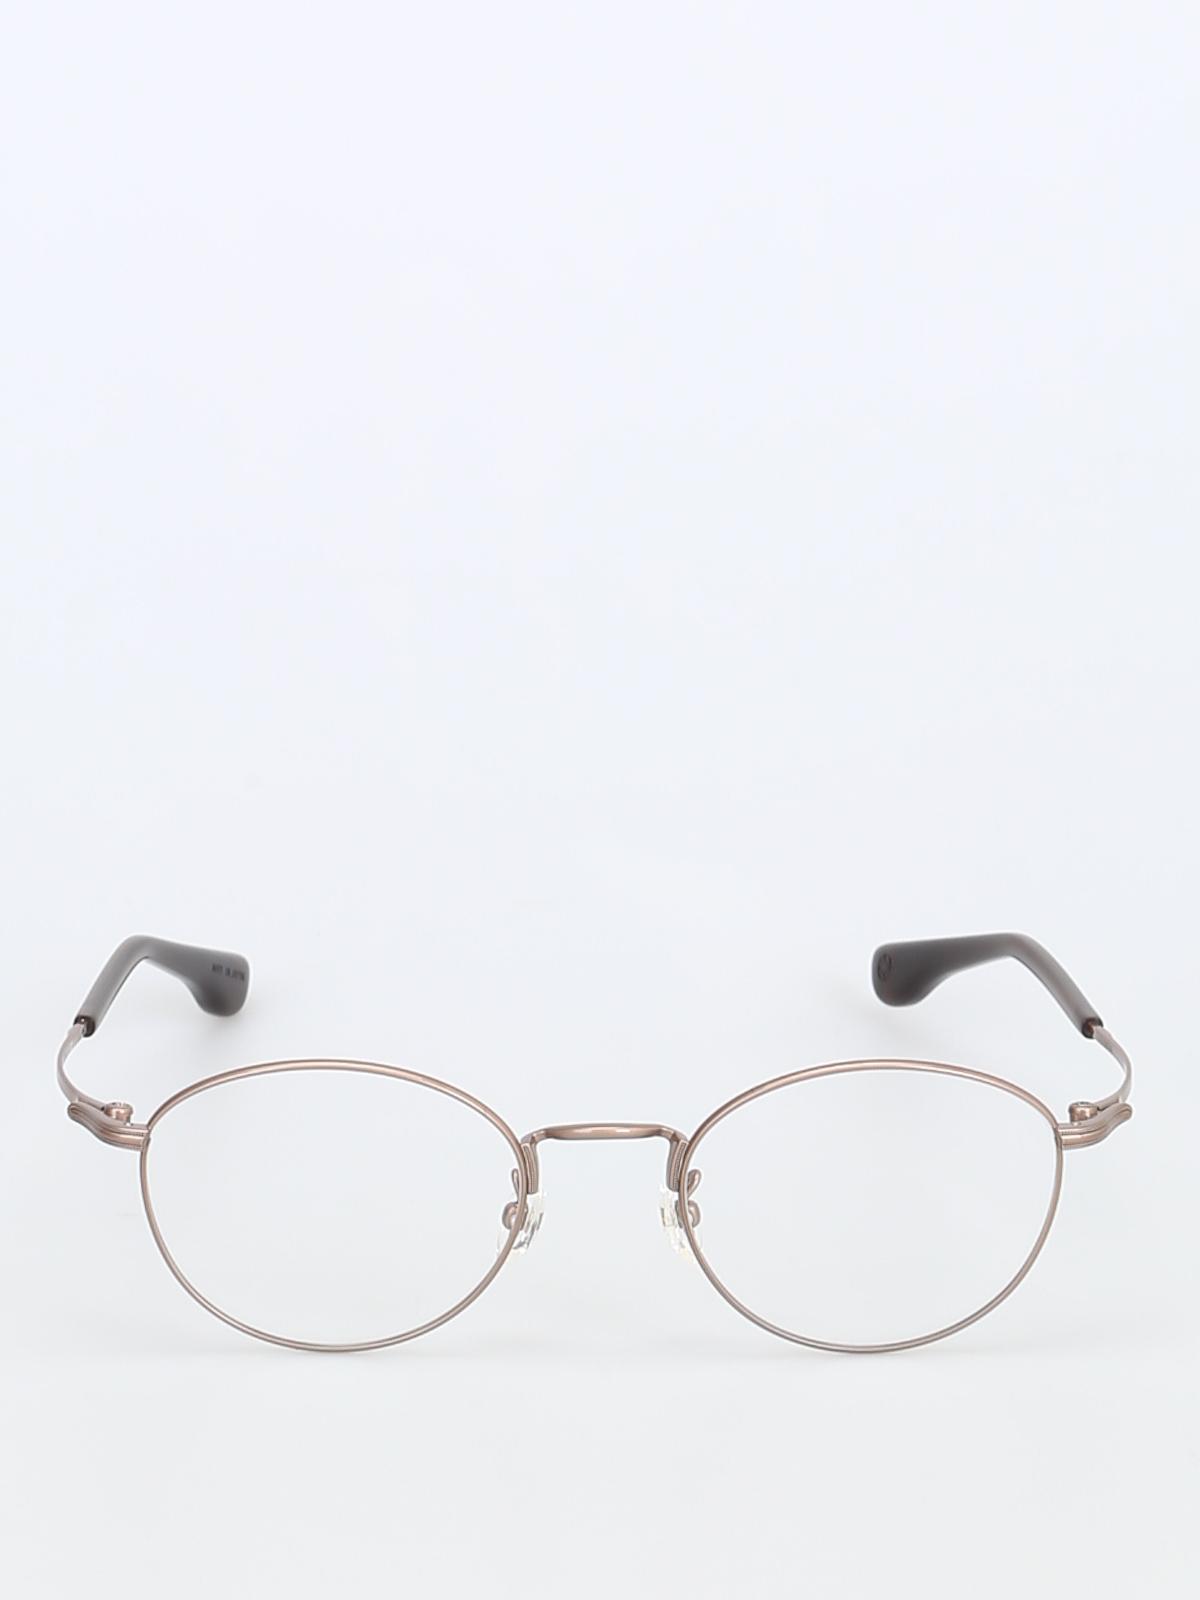 5cbca91fbf iKRIX 999.9 FOUR NINES  Glasses - Metal round slender frame eyeglasses